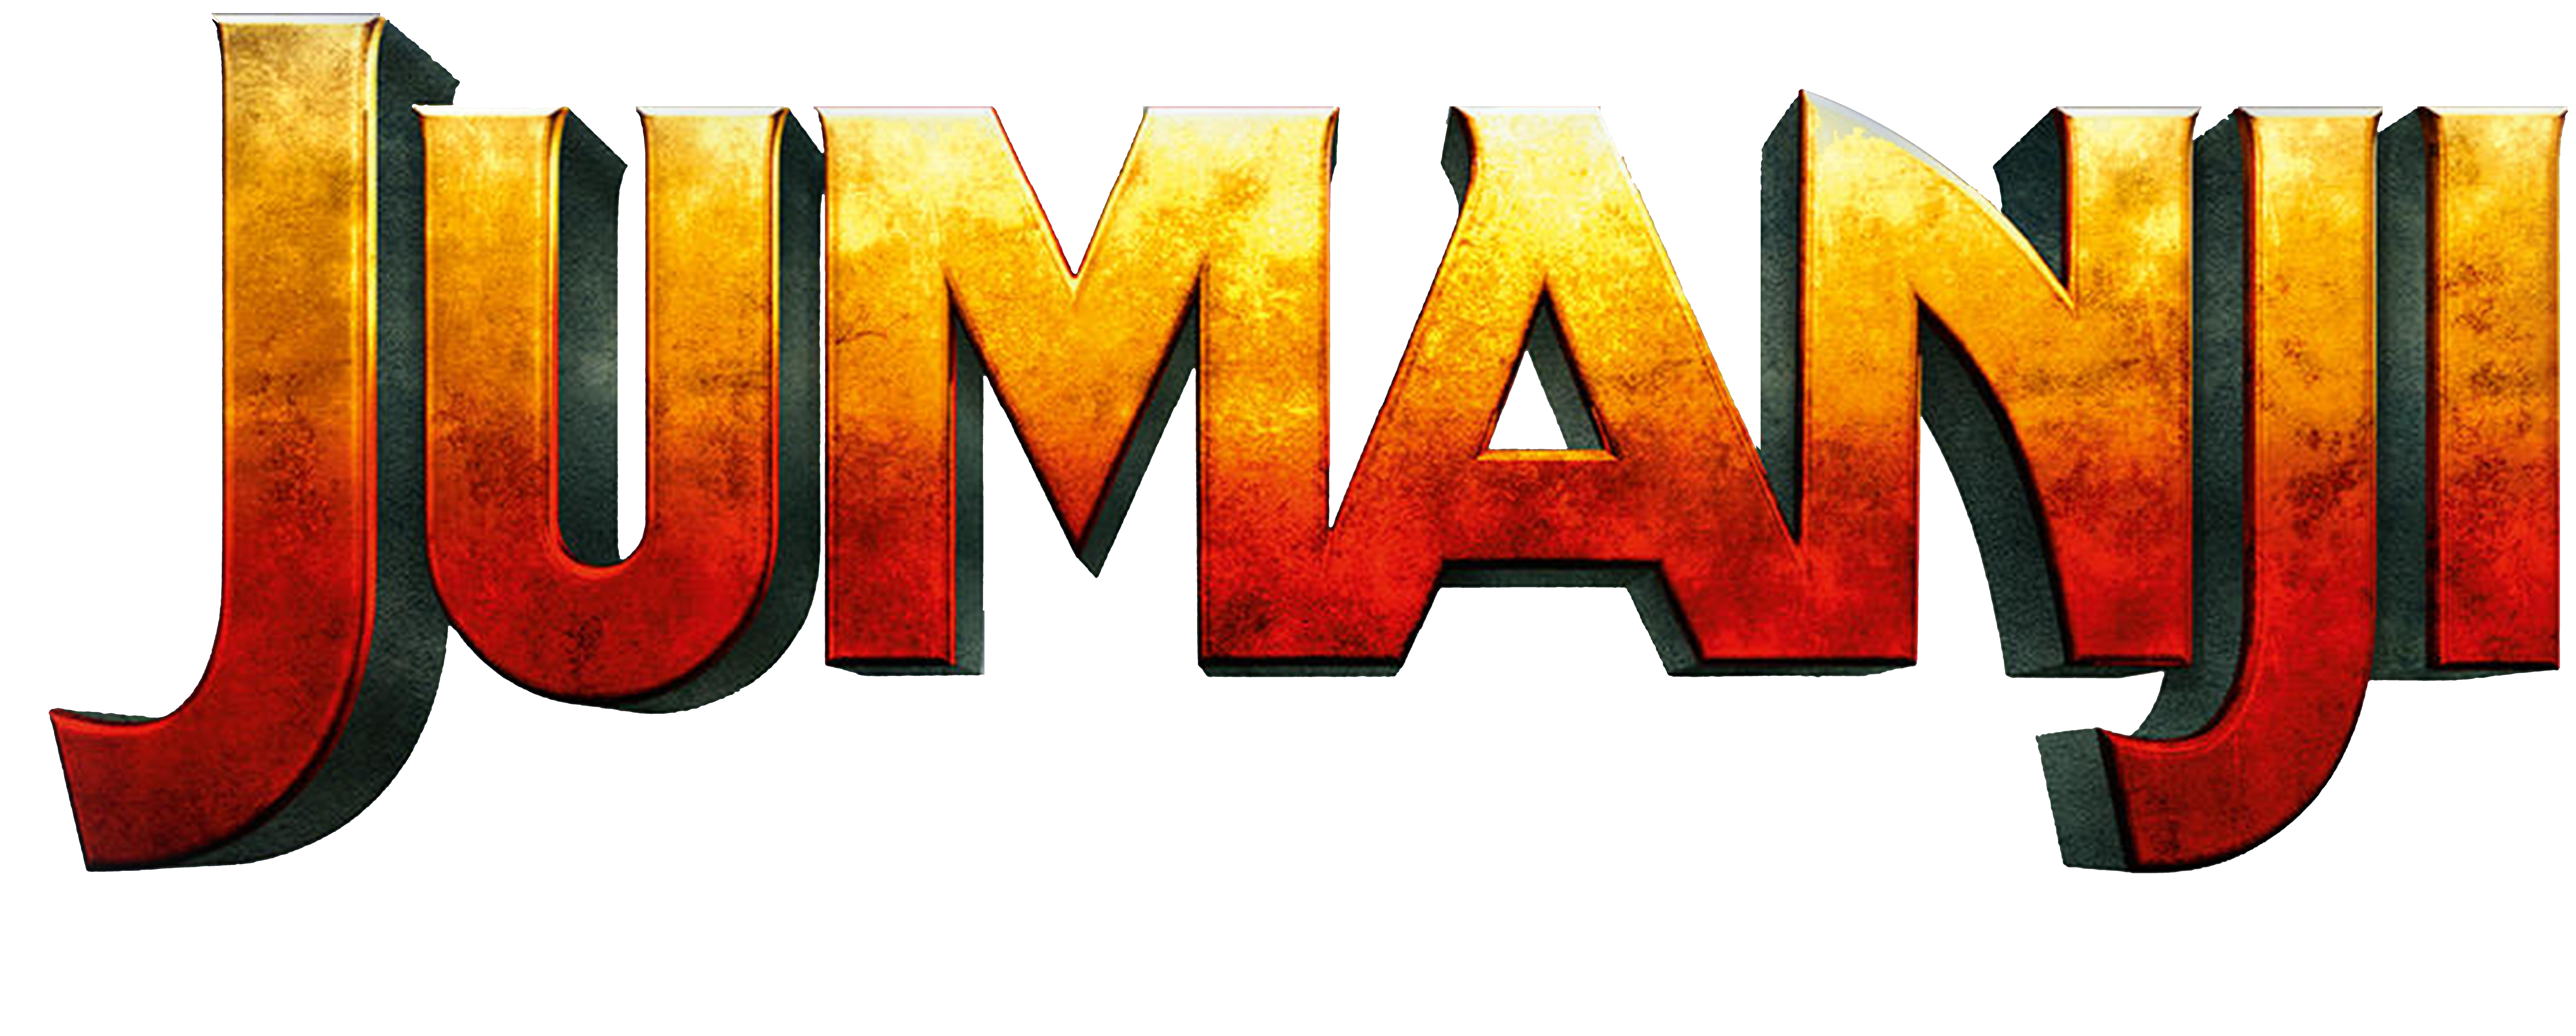 Jumanji - Life Size Game